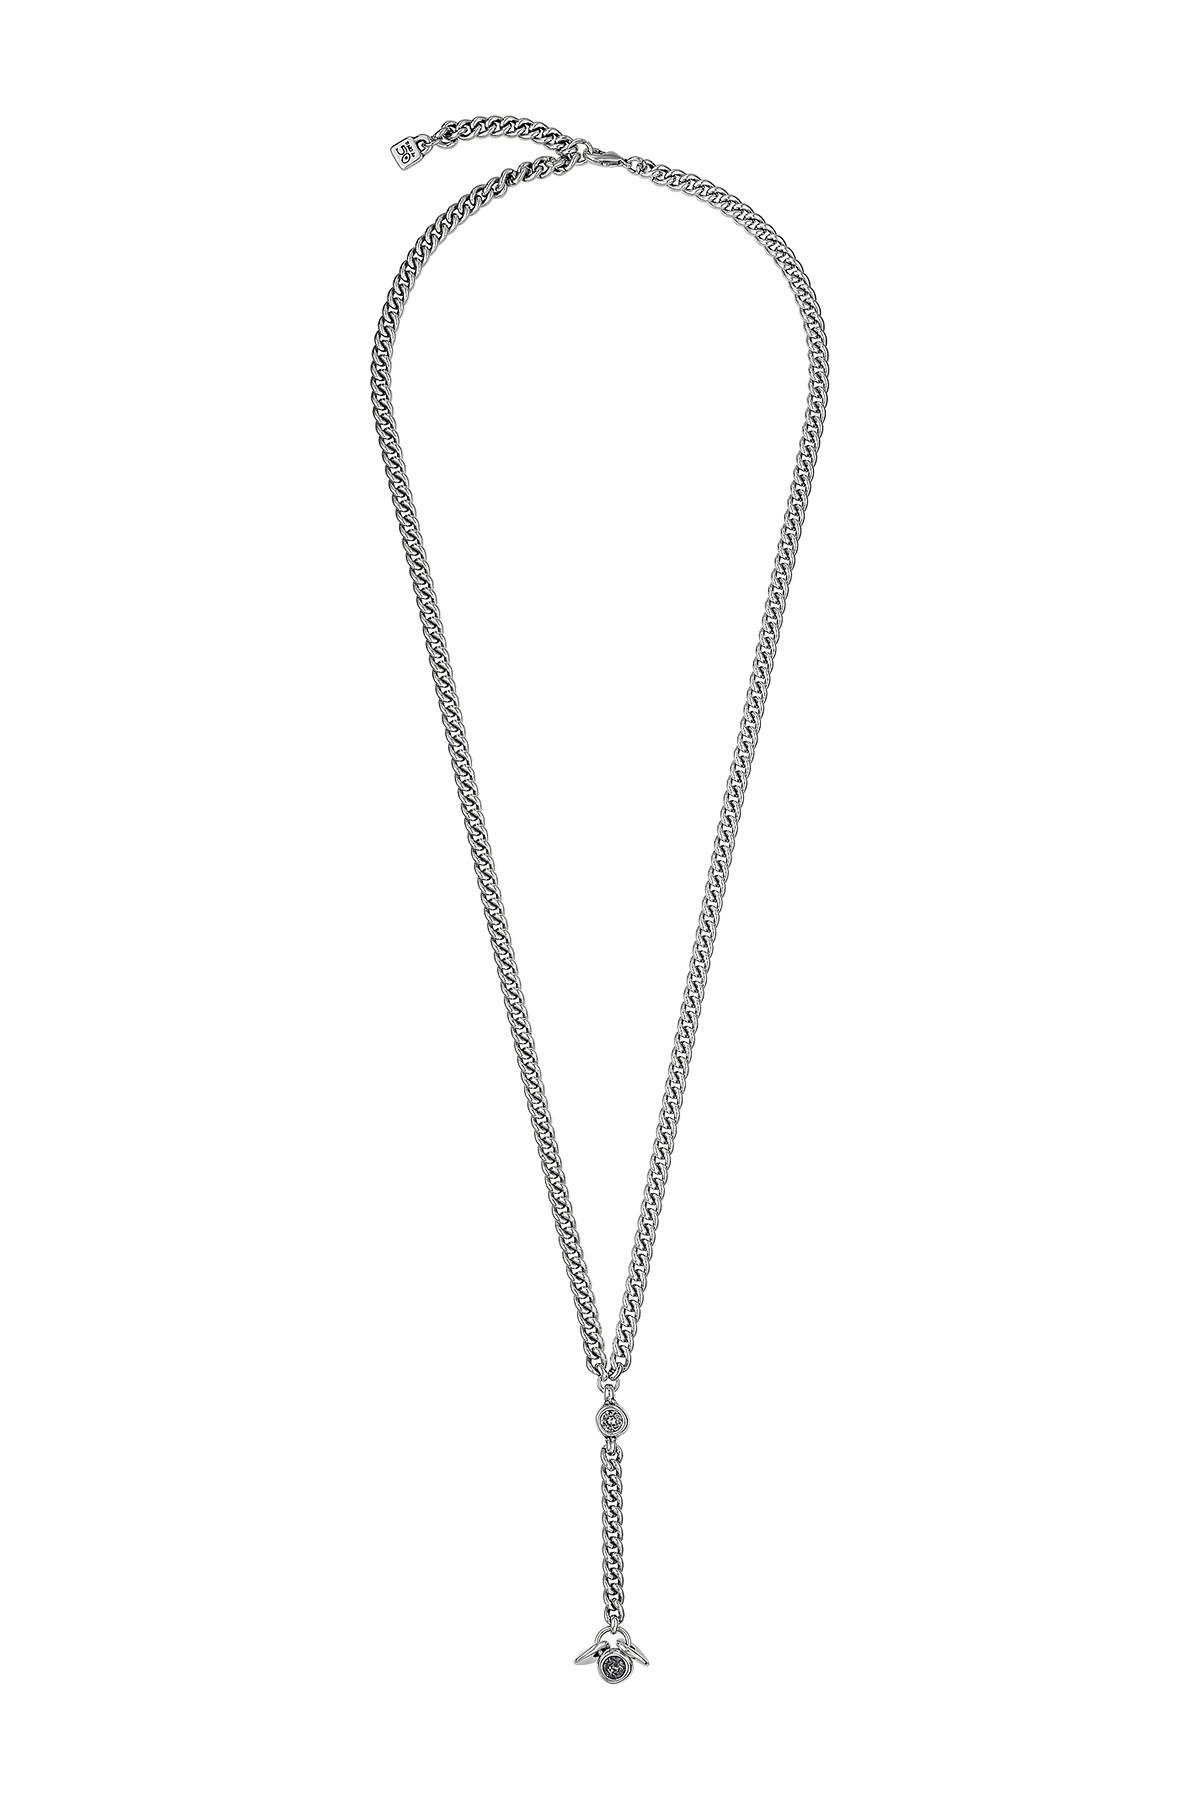 Uno De 50 | Crusoe Bezel Set Swrovski Crystal Element Y Drop Necklace |  Nordstrom Rack For Newest Letter Y Alphabet Locket Element Necklaces (View 21 of 25)